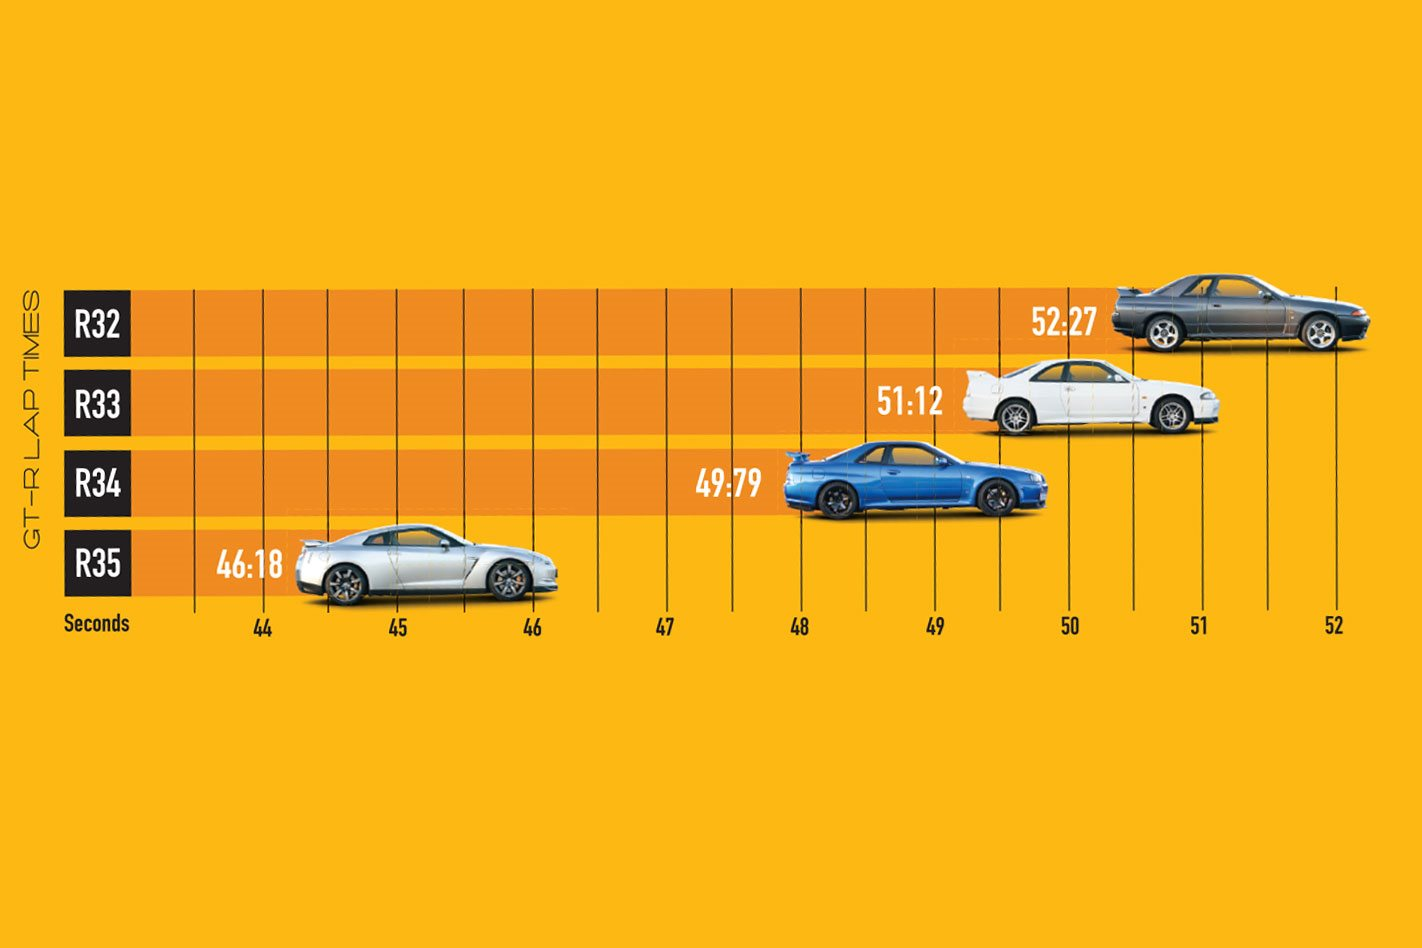 Nissan GT-R R32 vs R33 vs R34 vs R35 comparison: Classic MOTOR